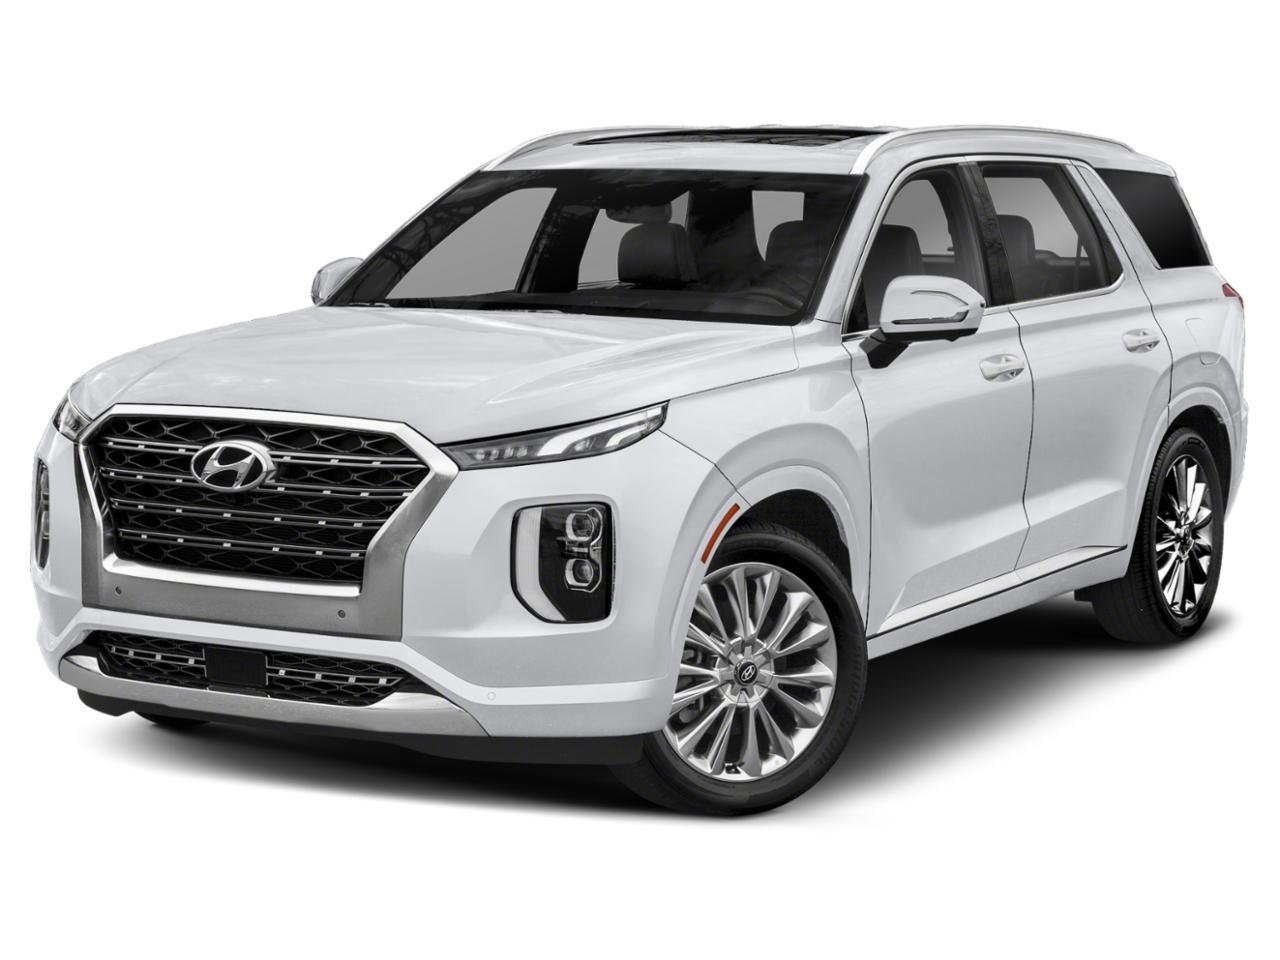 2020 Hyundai Palisade Vehicle Photo in O'Fallon, IL 62269